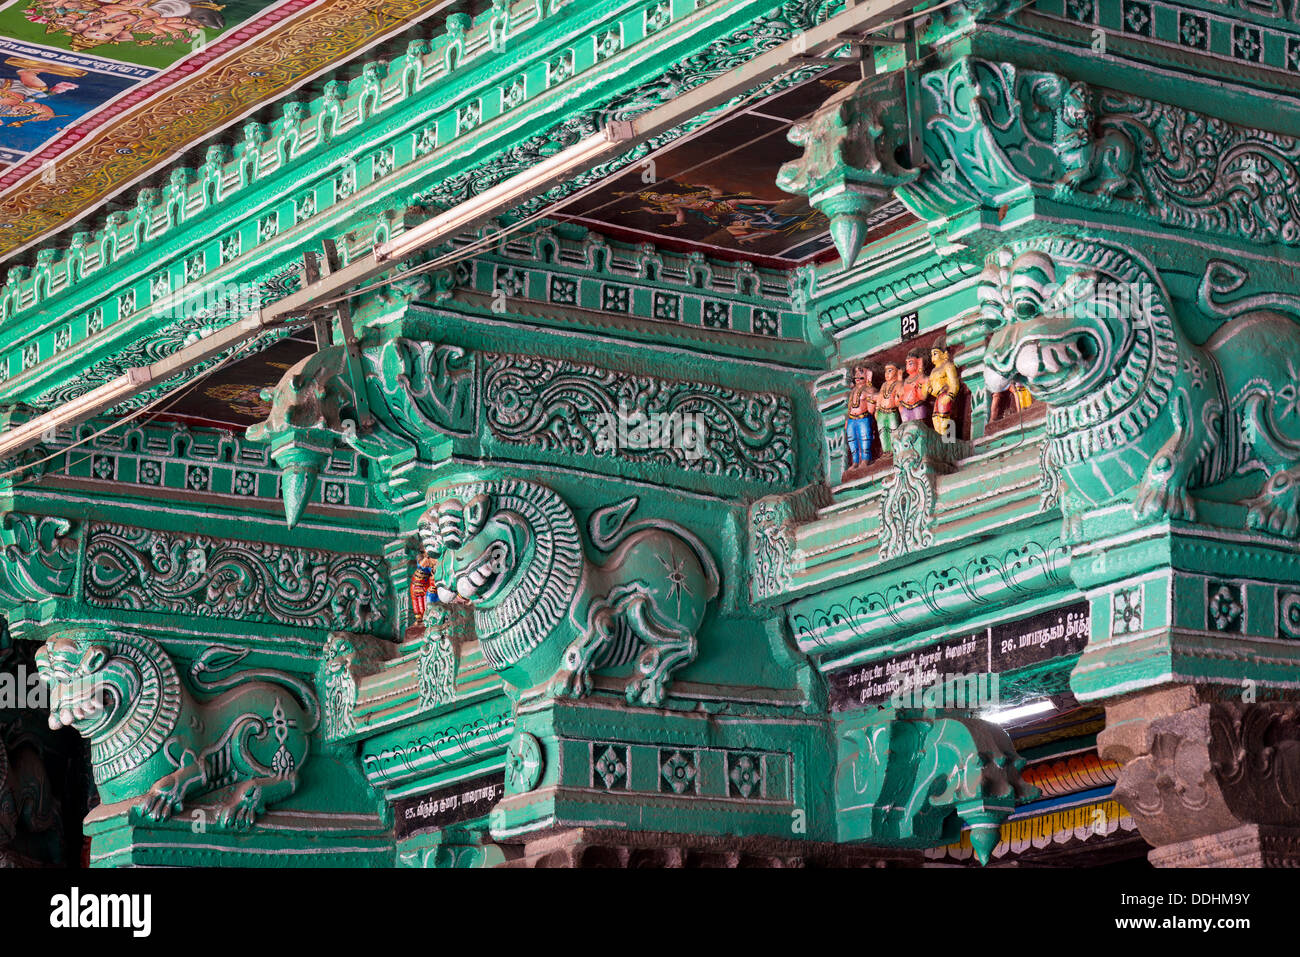 Pilares pintados de verde, criaturas míticas, Meenakshi Amman Temple o Templo de Sri Meenakshi Sundareswarar Imagen De Stock